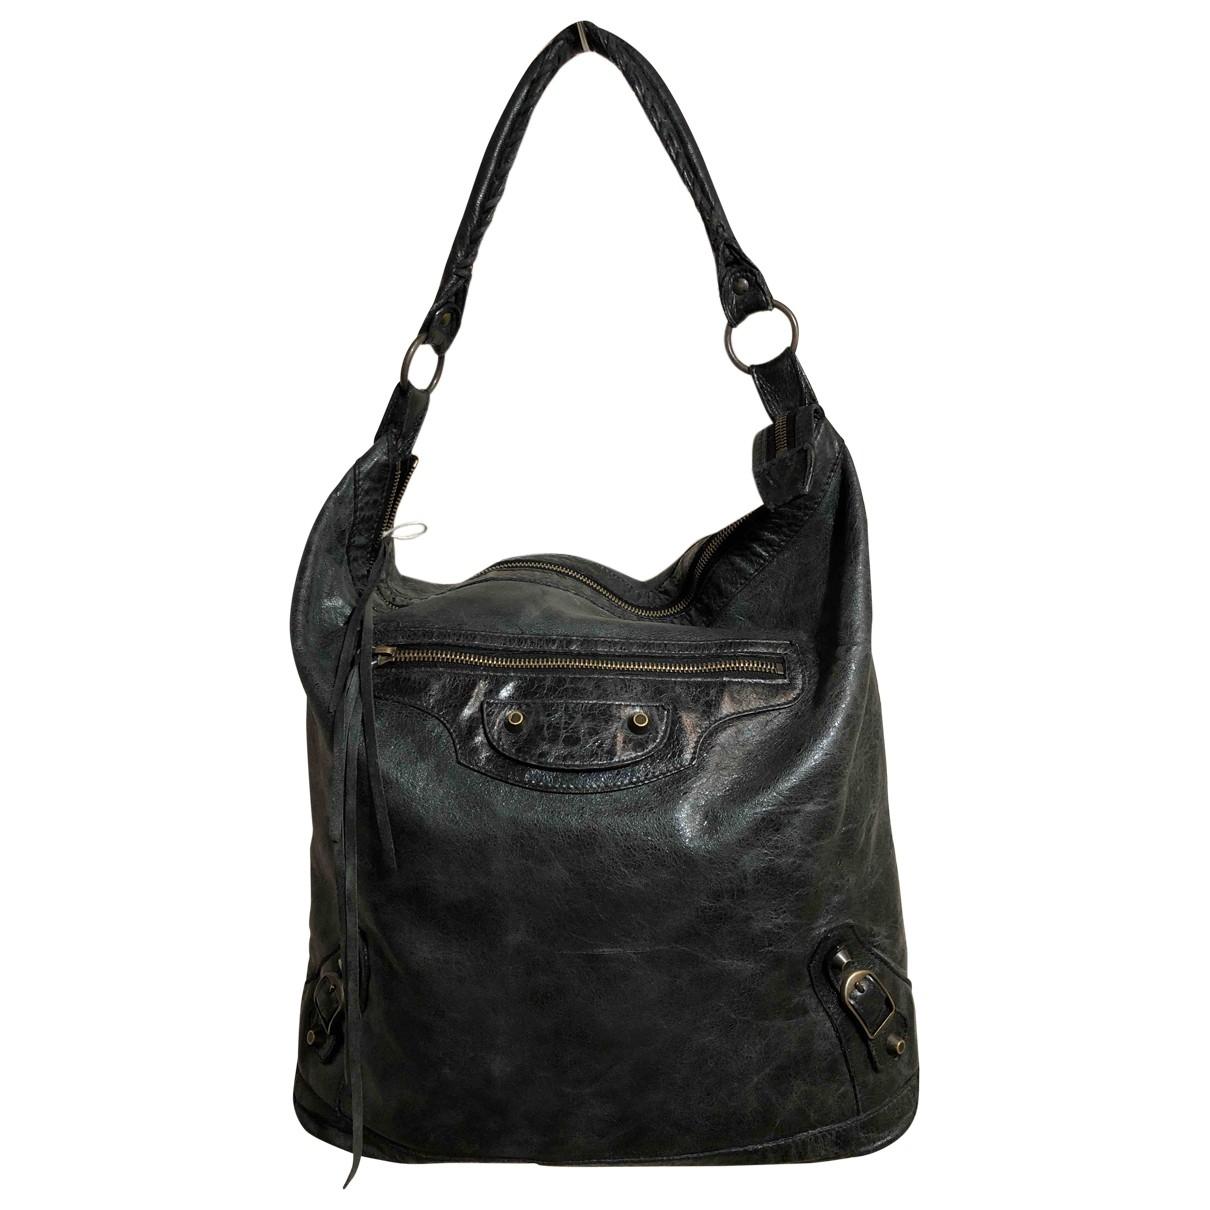 Balenciaga \N Handtasche in  Gruen Leder